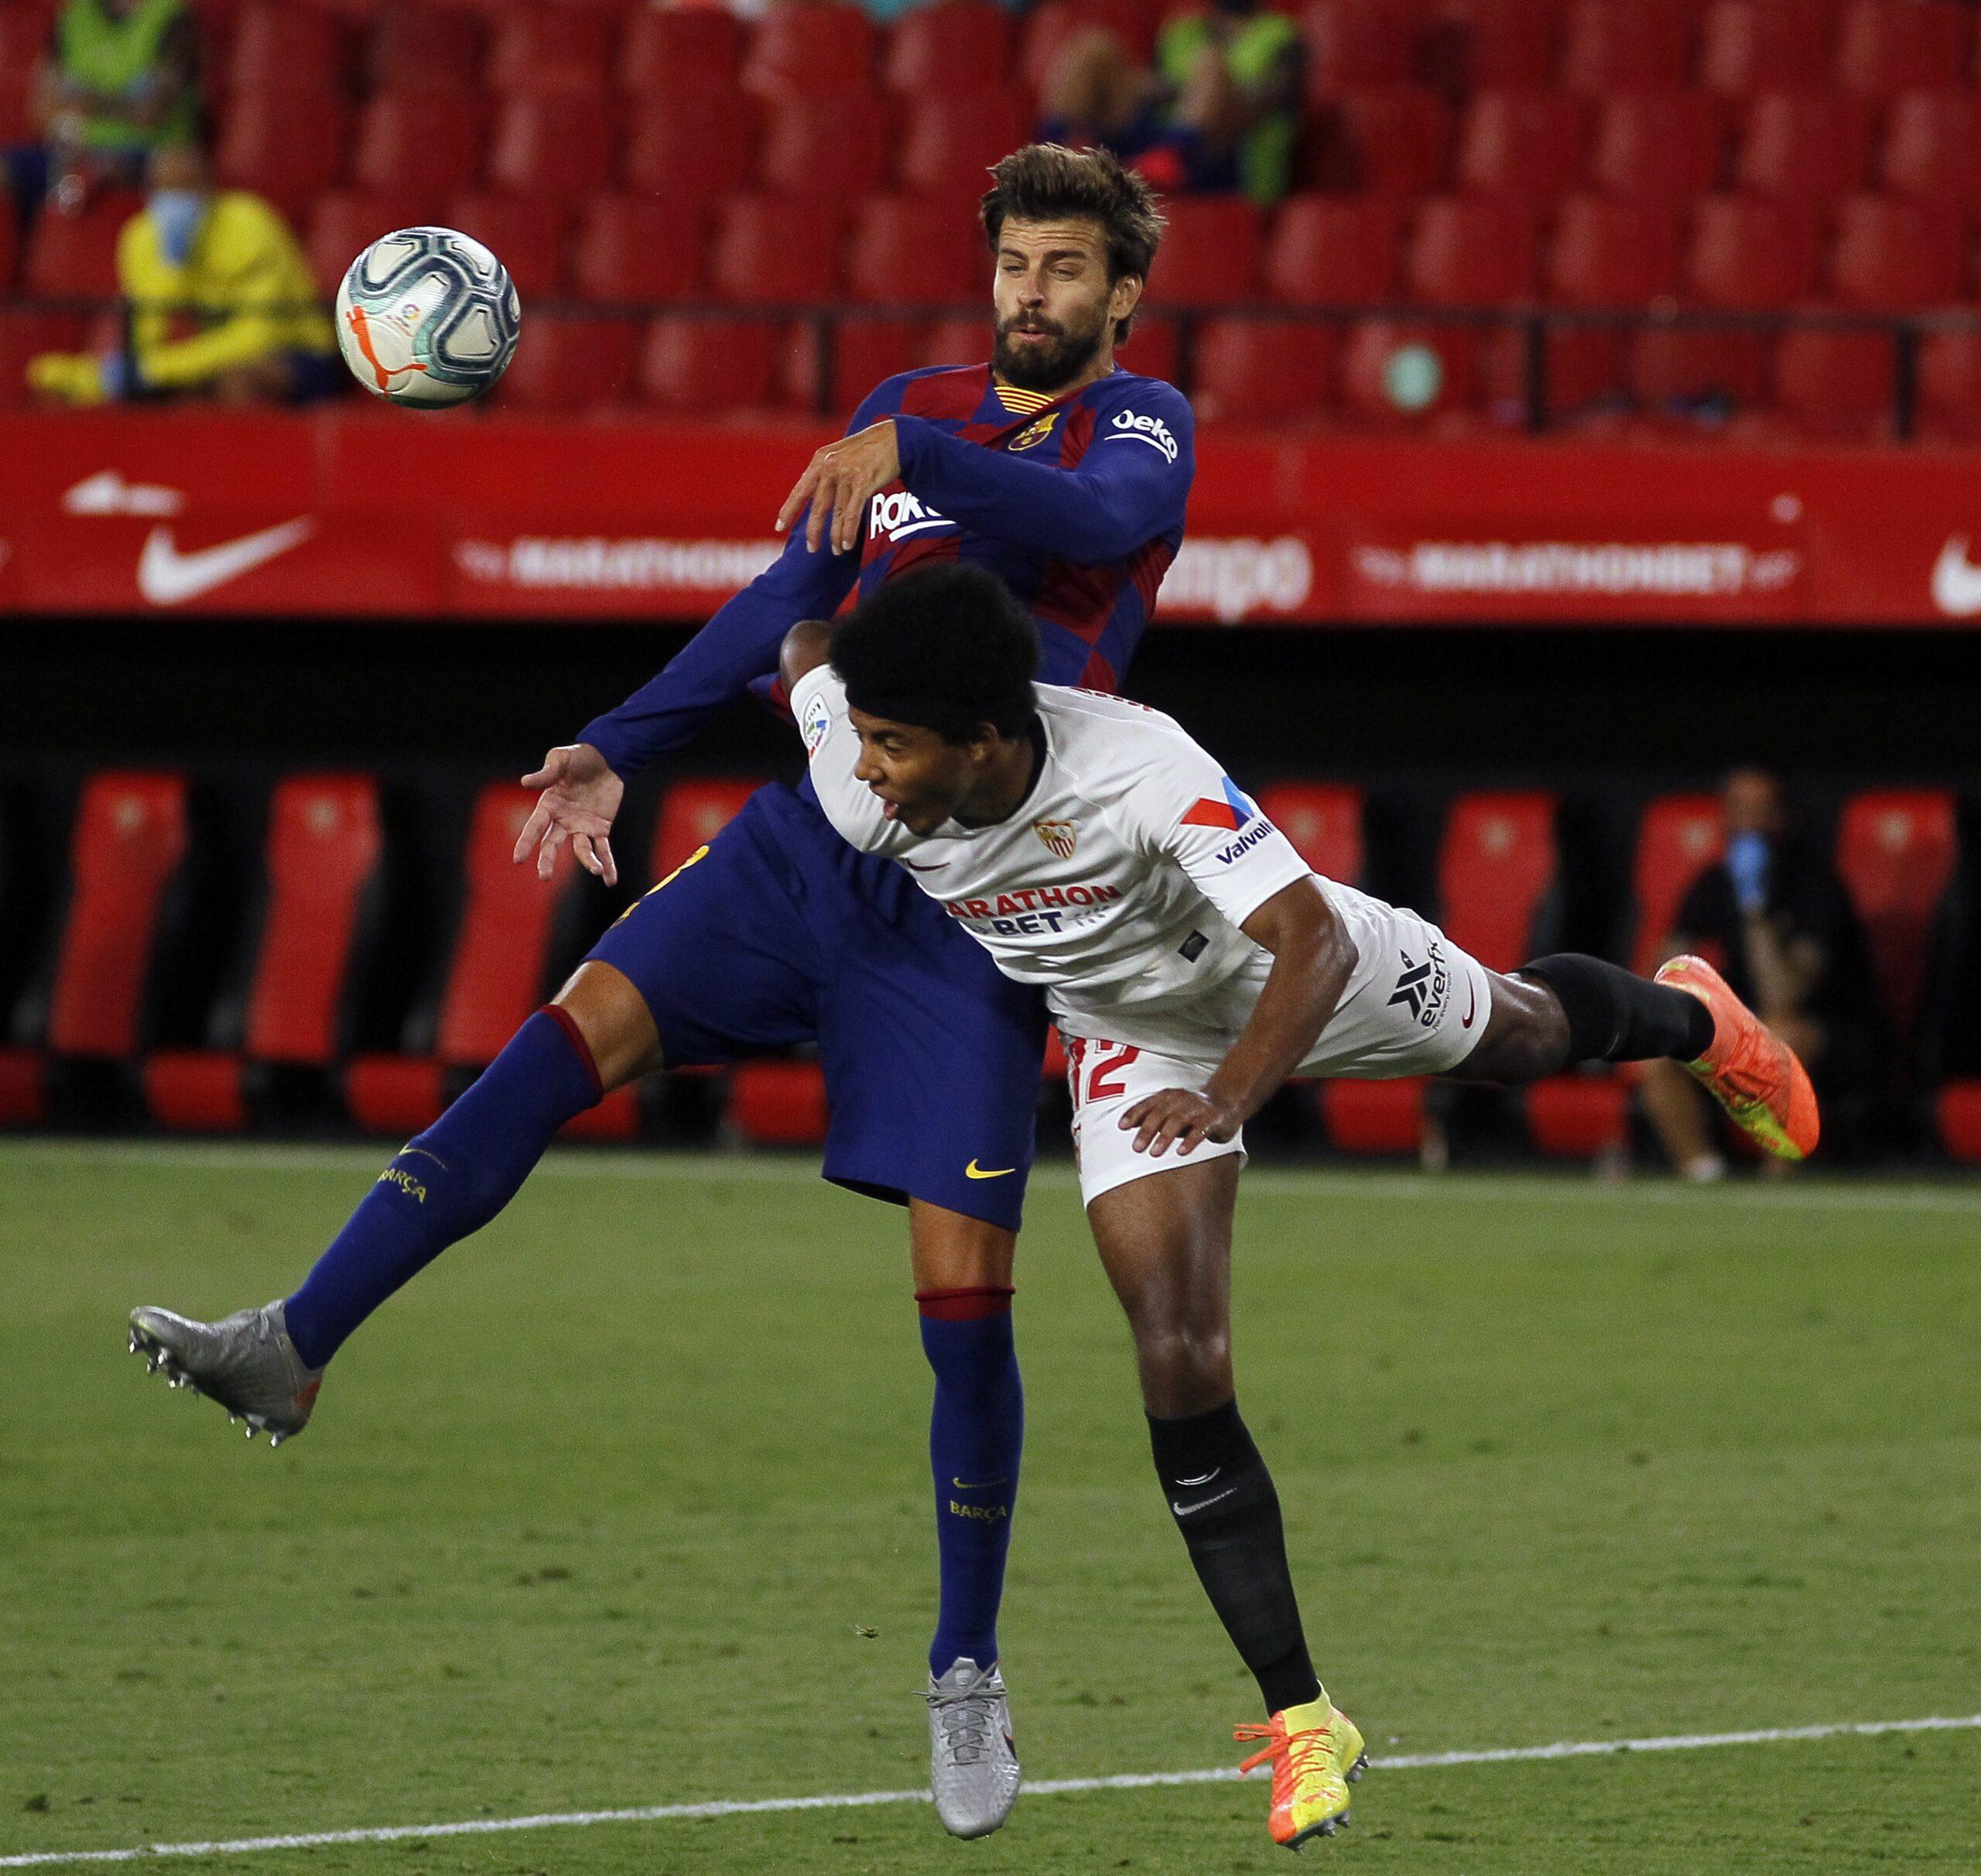 Piqué i Koundé, durant el partit al Sánchez Pizjuán | Europa Press